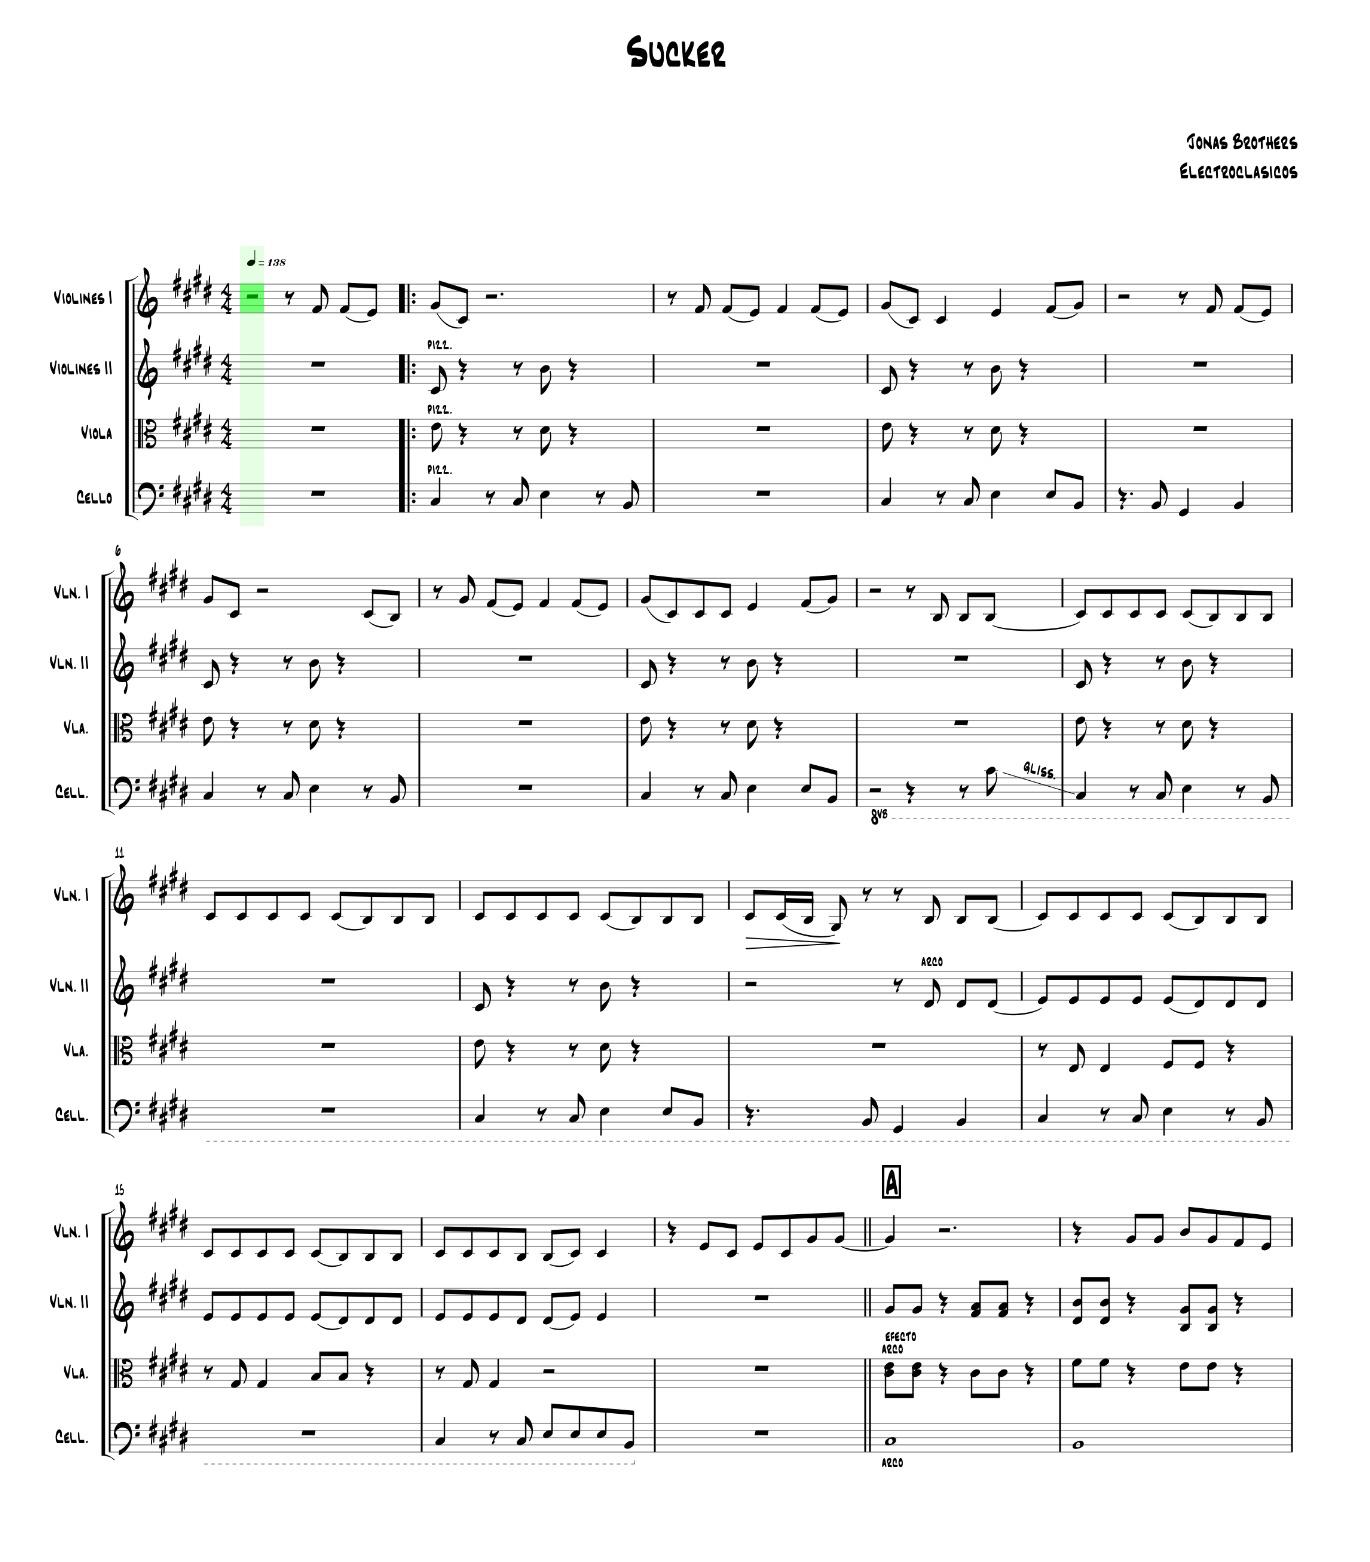 Sheet Music String Quartet Sucker, Jonas Brothers